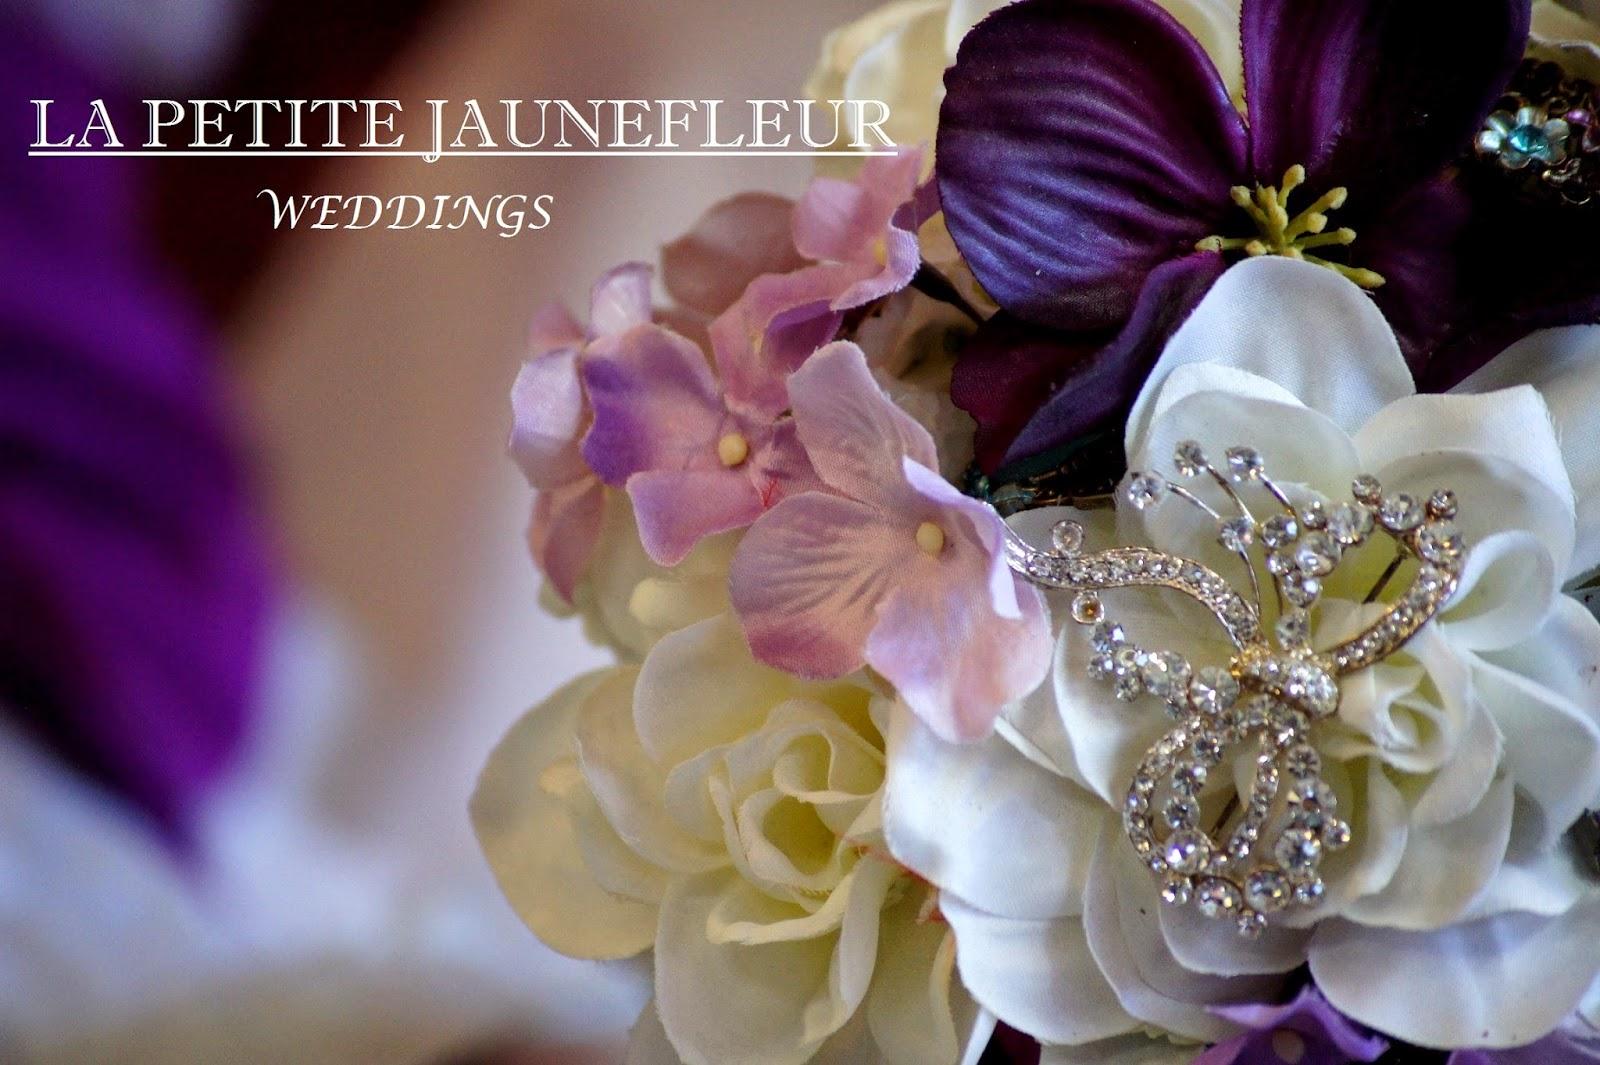 http://jaunefleurflowers.com/